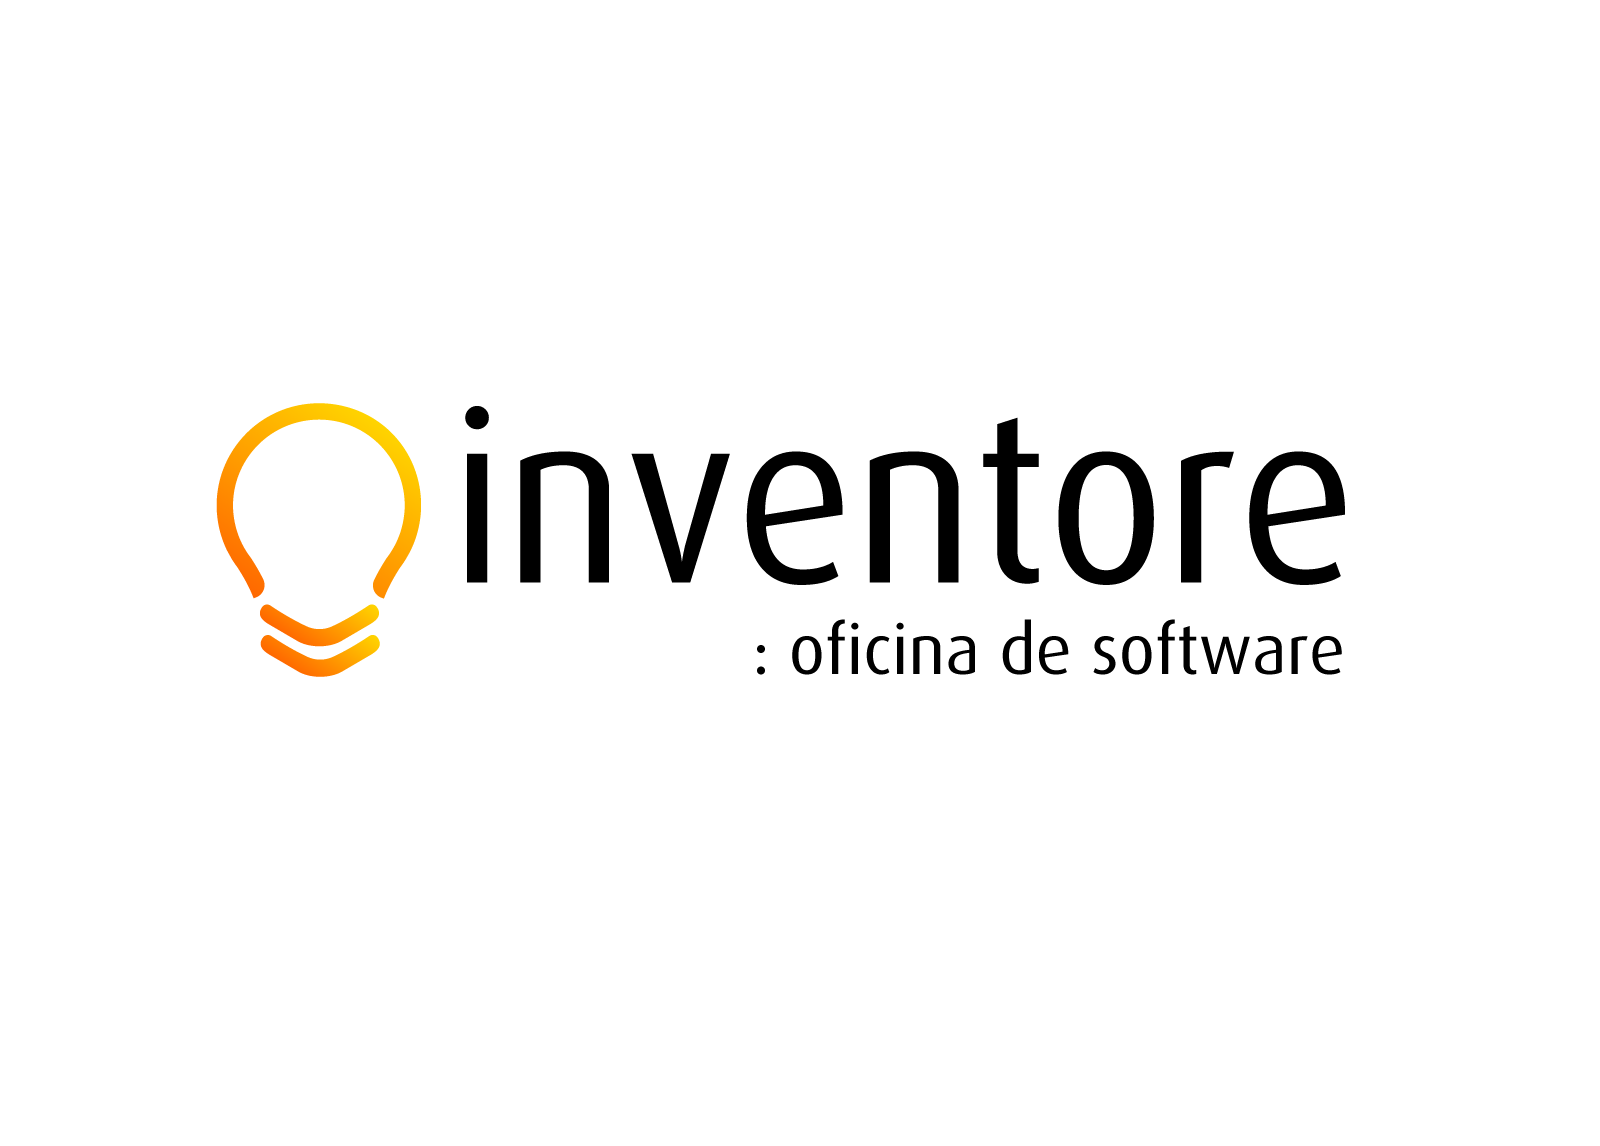 Logotipo inventore 2018